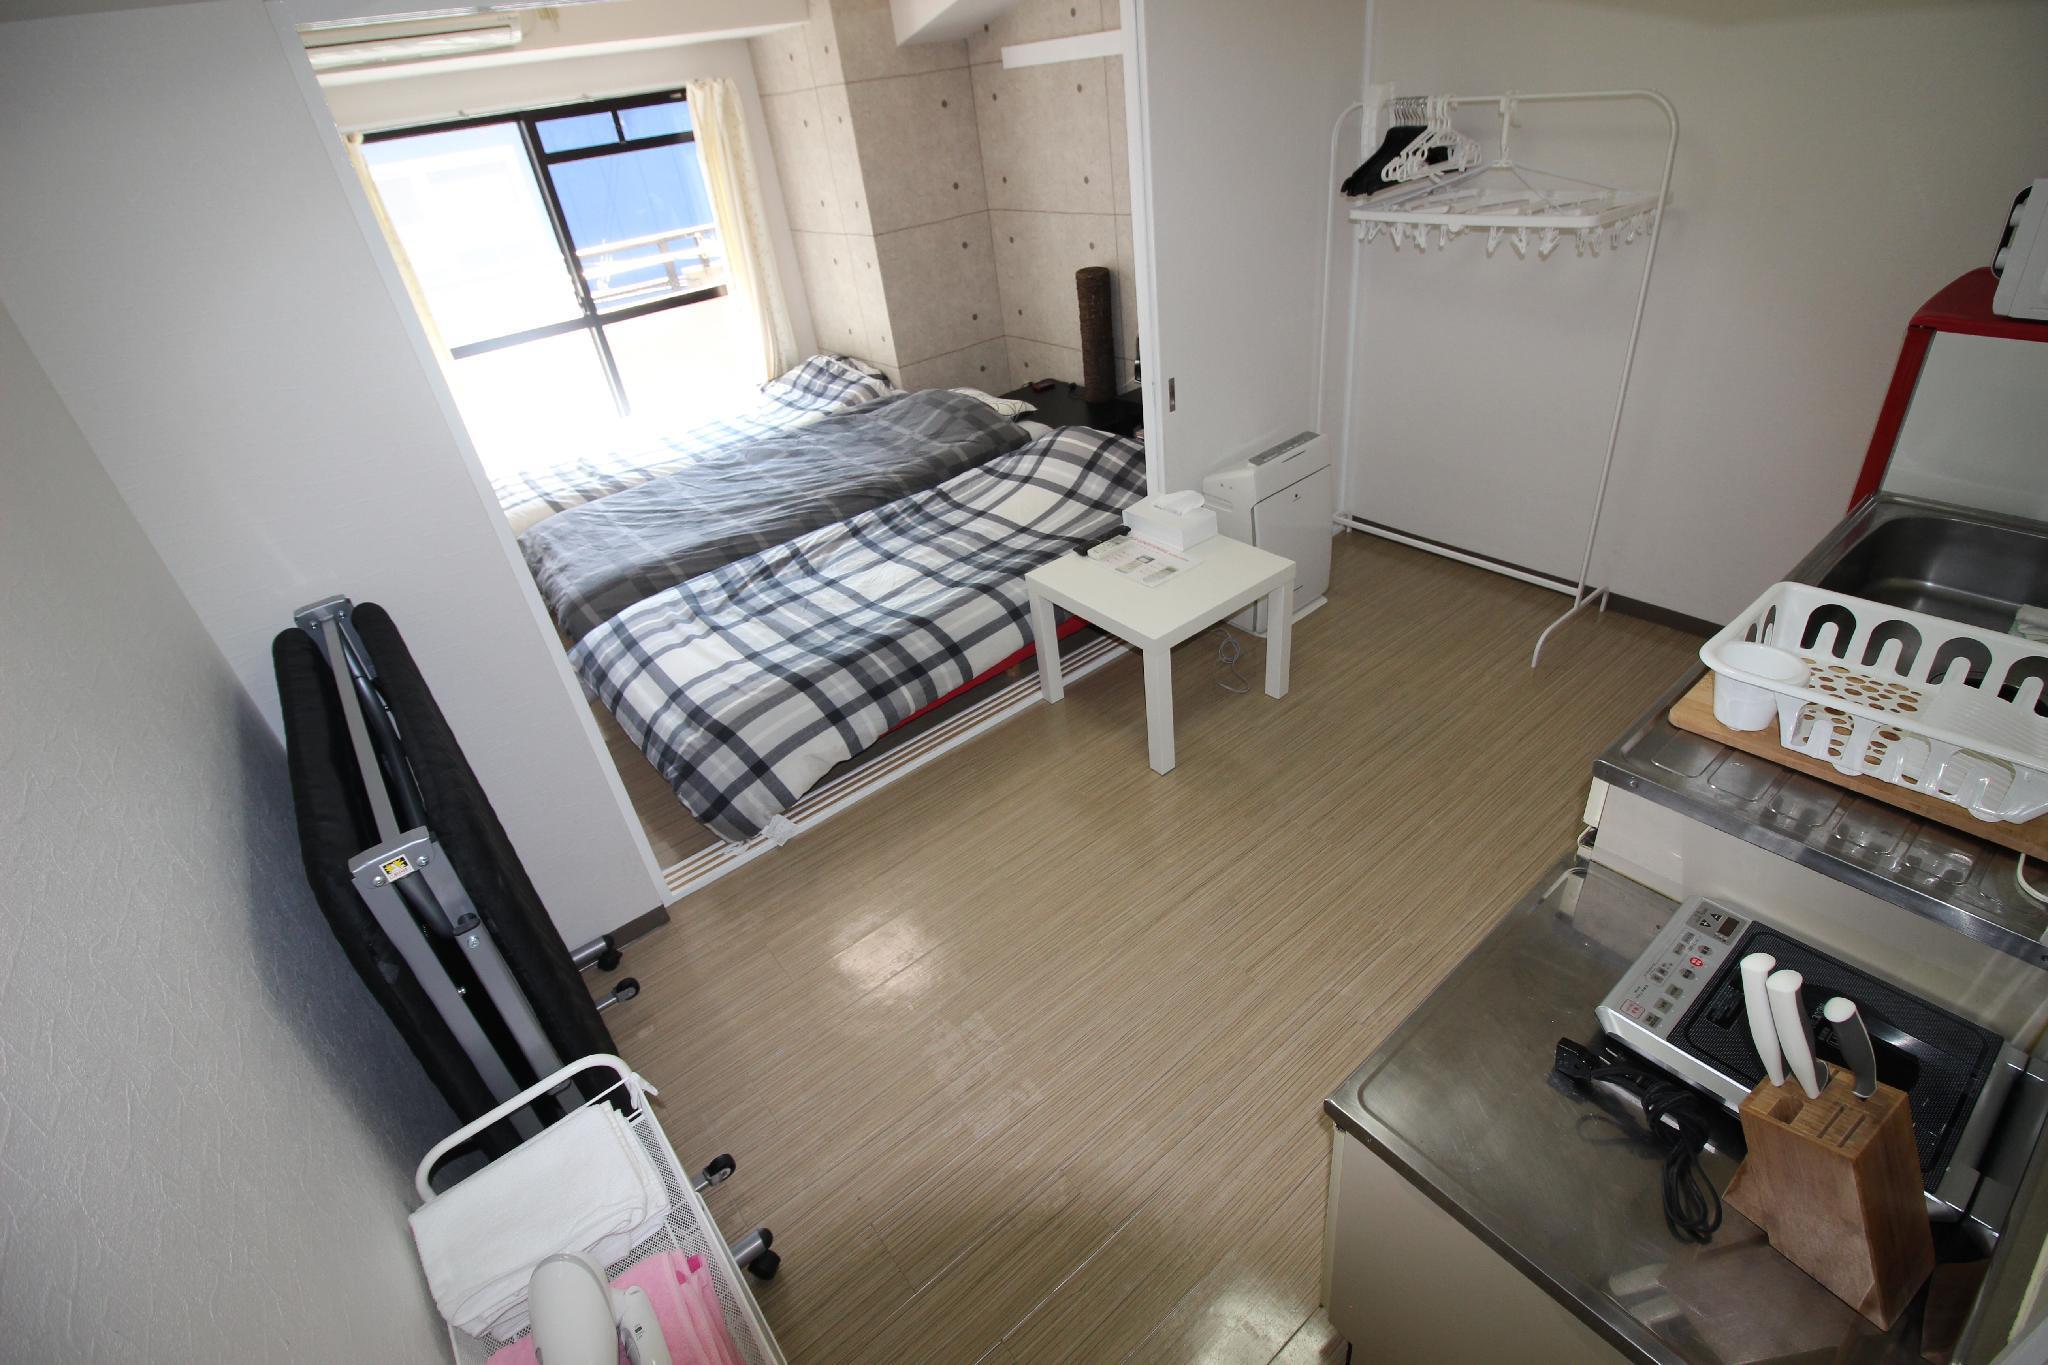 BB 1 Bedroom Apt In Osaka 302 Paru